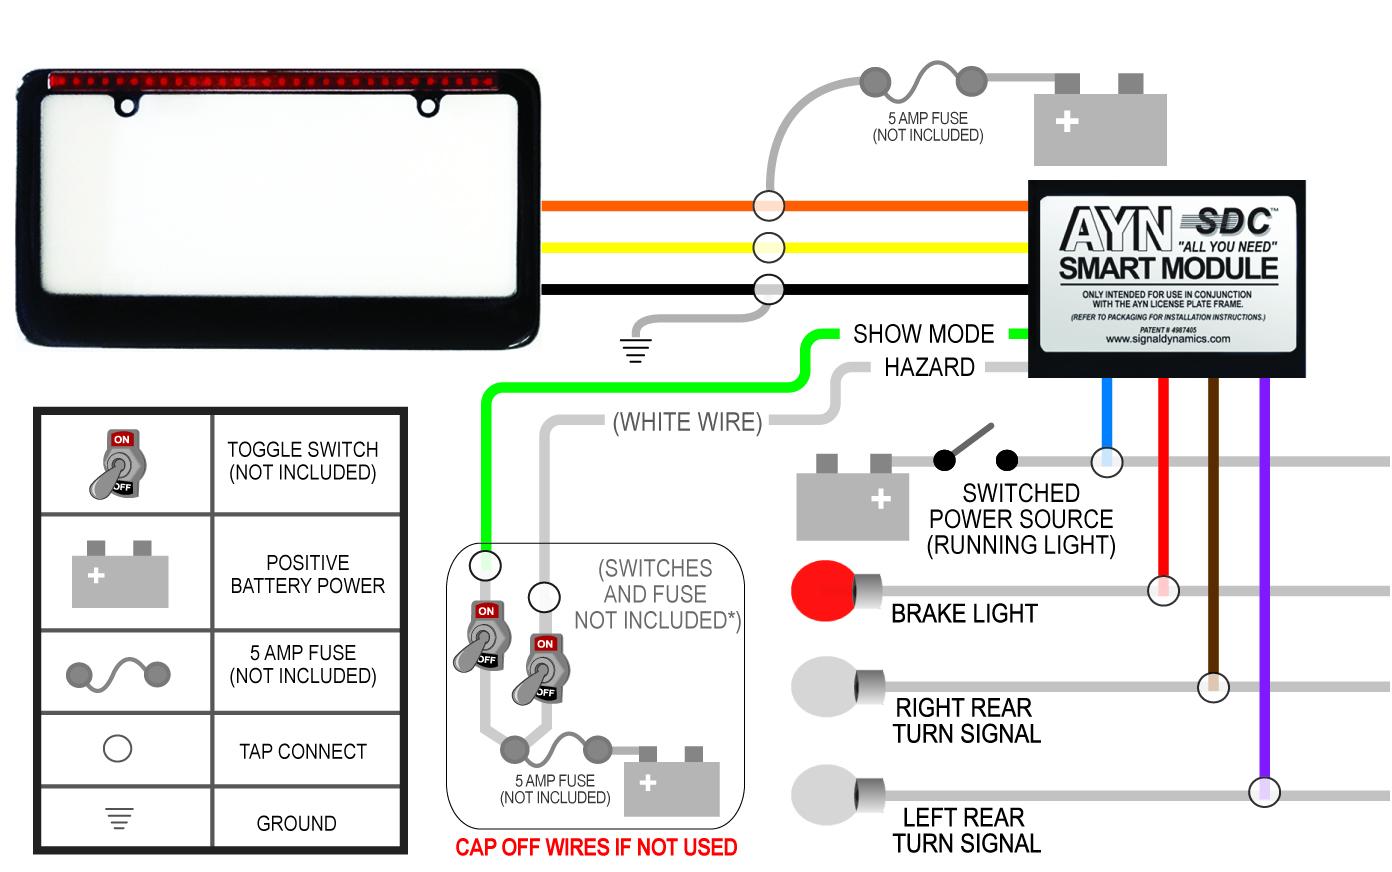 black auto wiring diagram?t=1399476781 black ayn automotive license plate frame & smart module combo Basic Turn Signal Wiring Diagram at sewacar.co